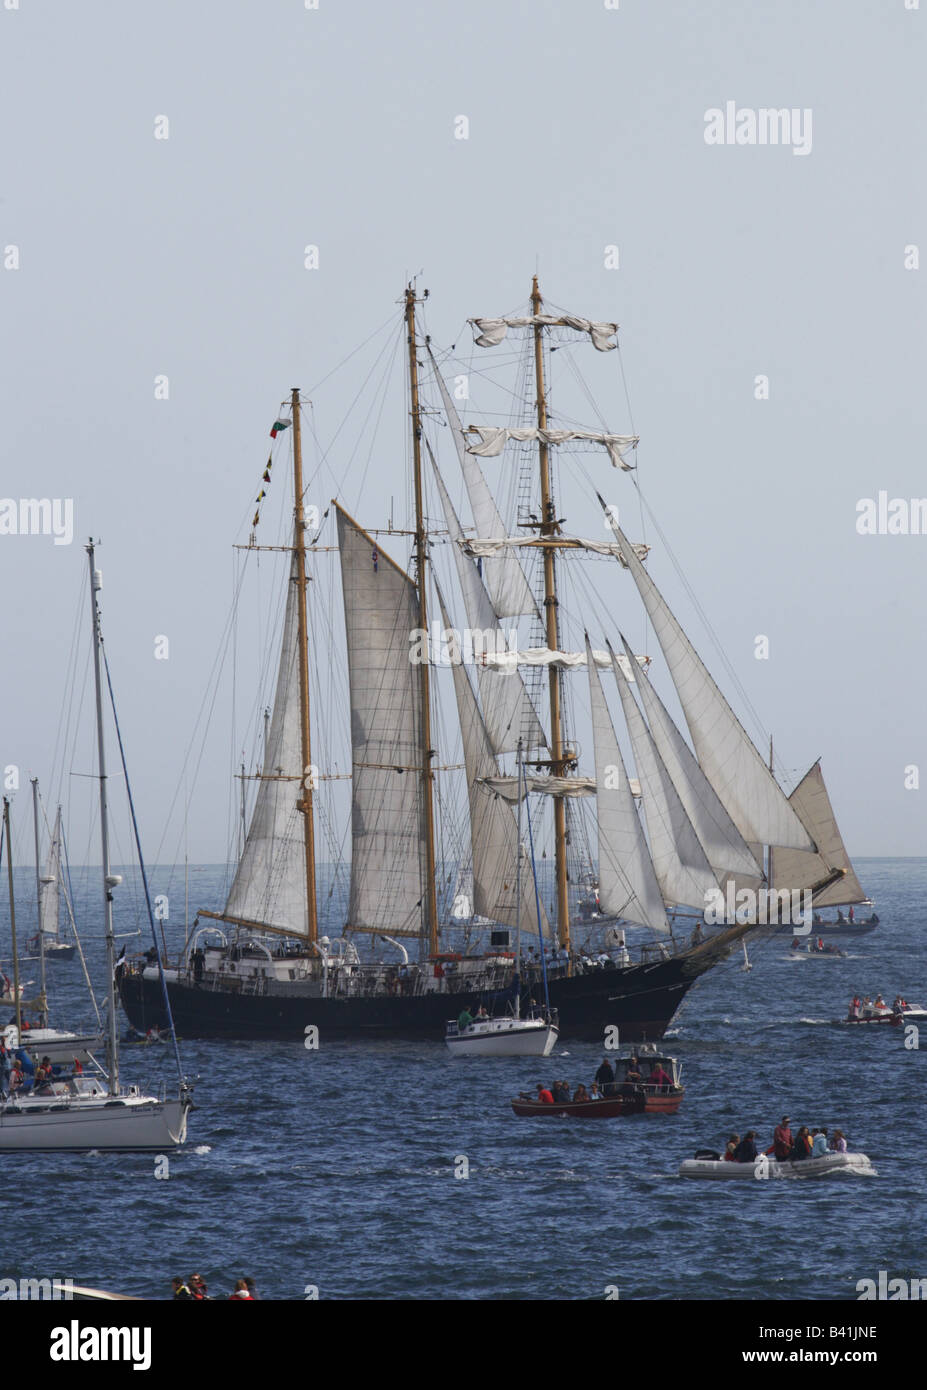 funchal 500 tall ship ships race falmouth cornwall england uk - Stock Image